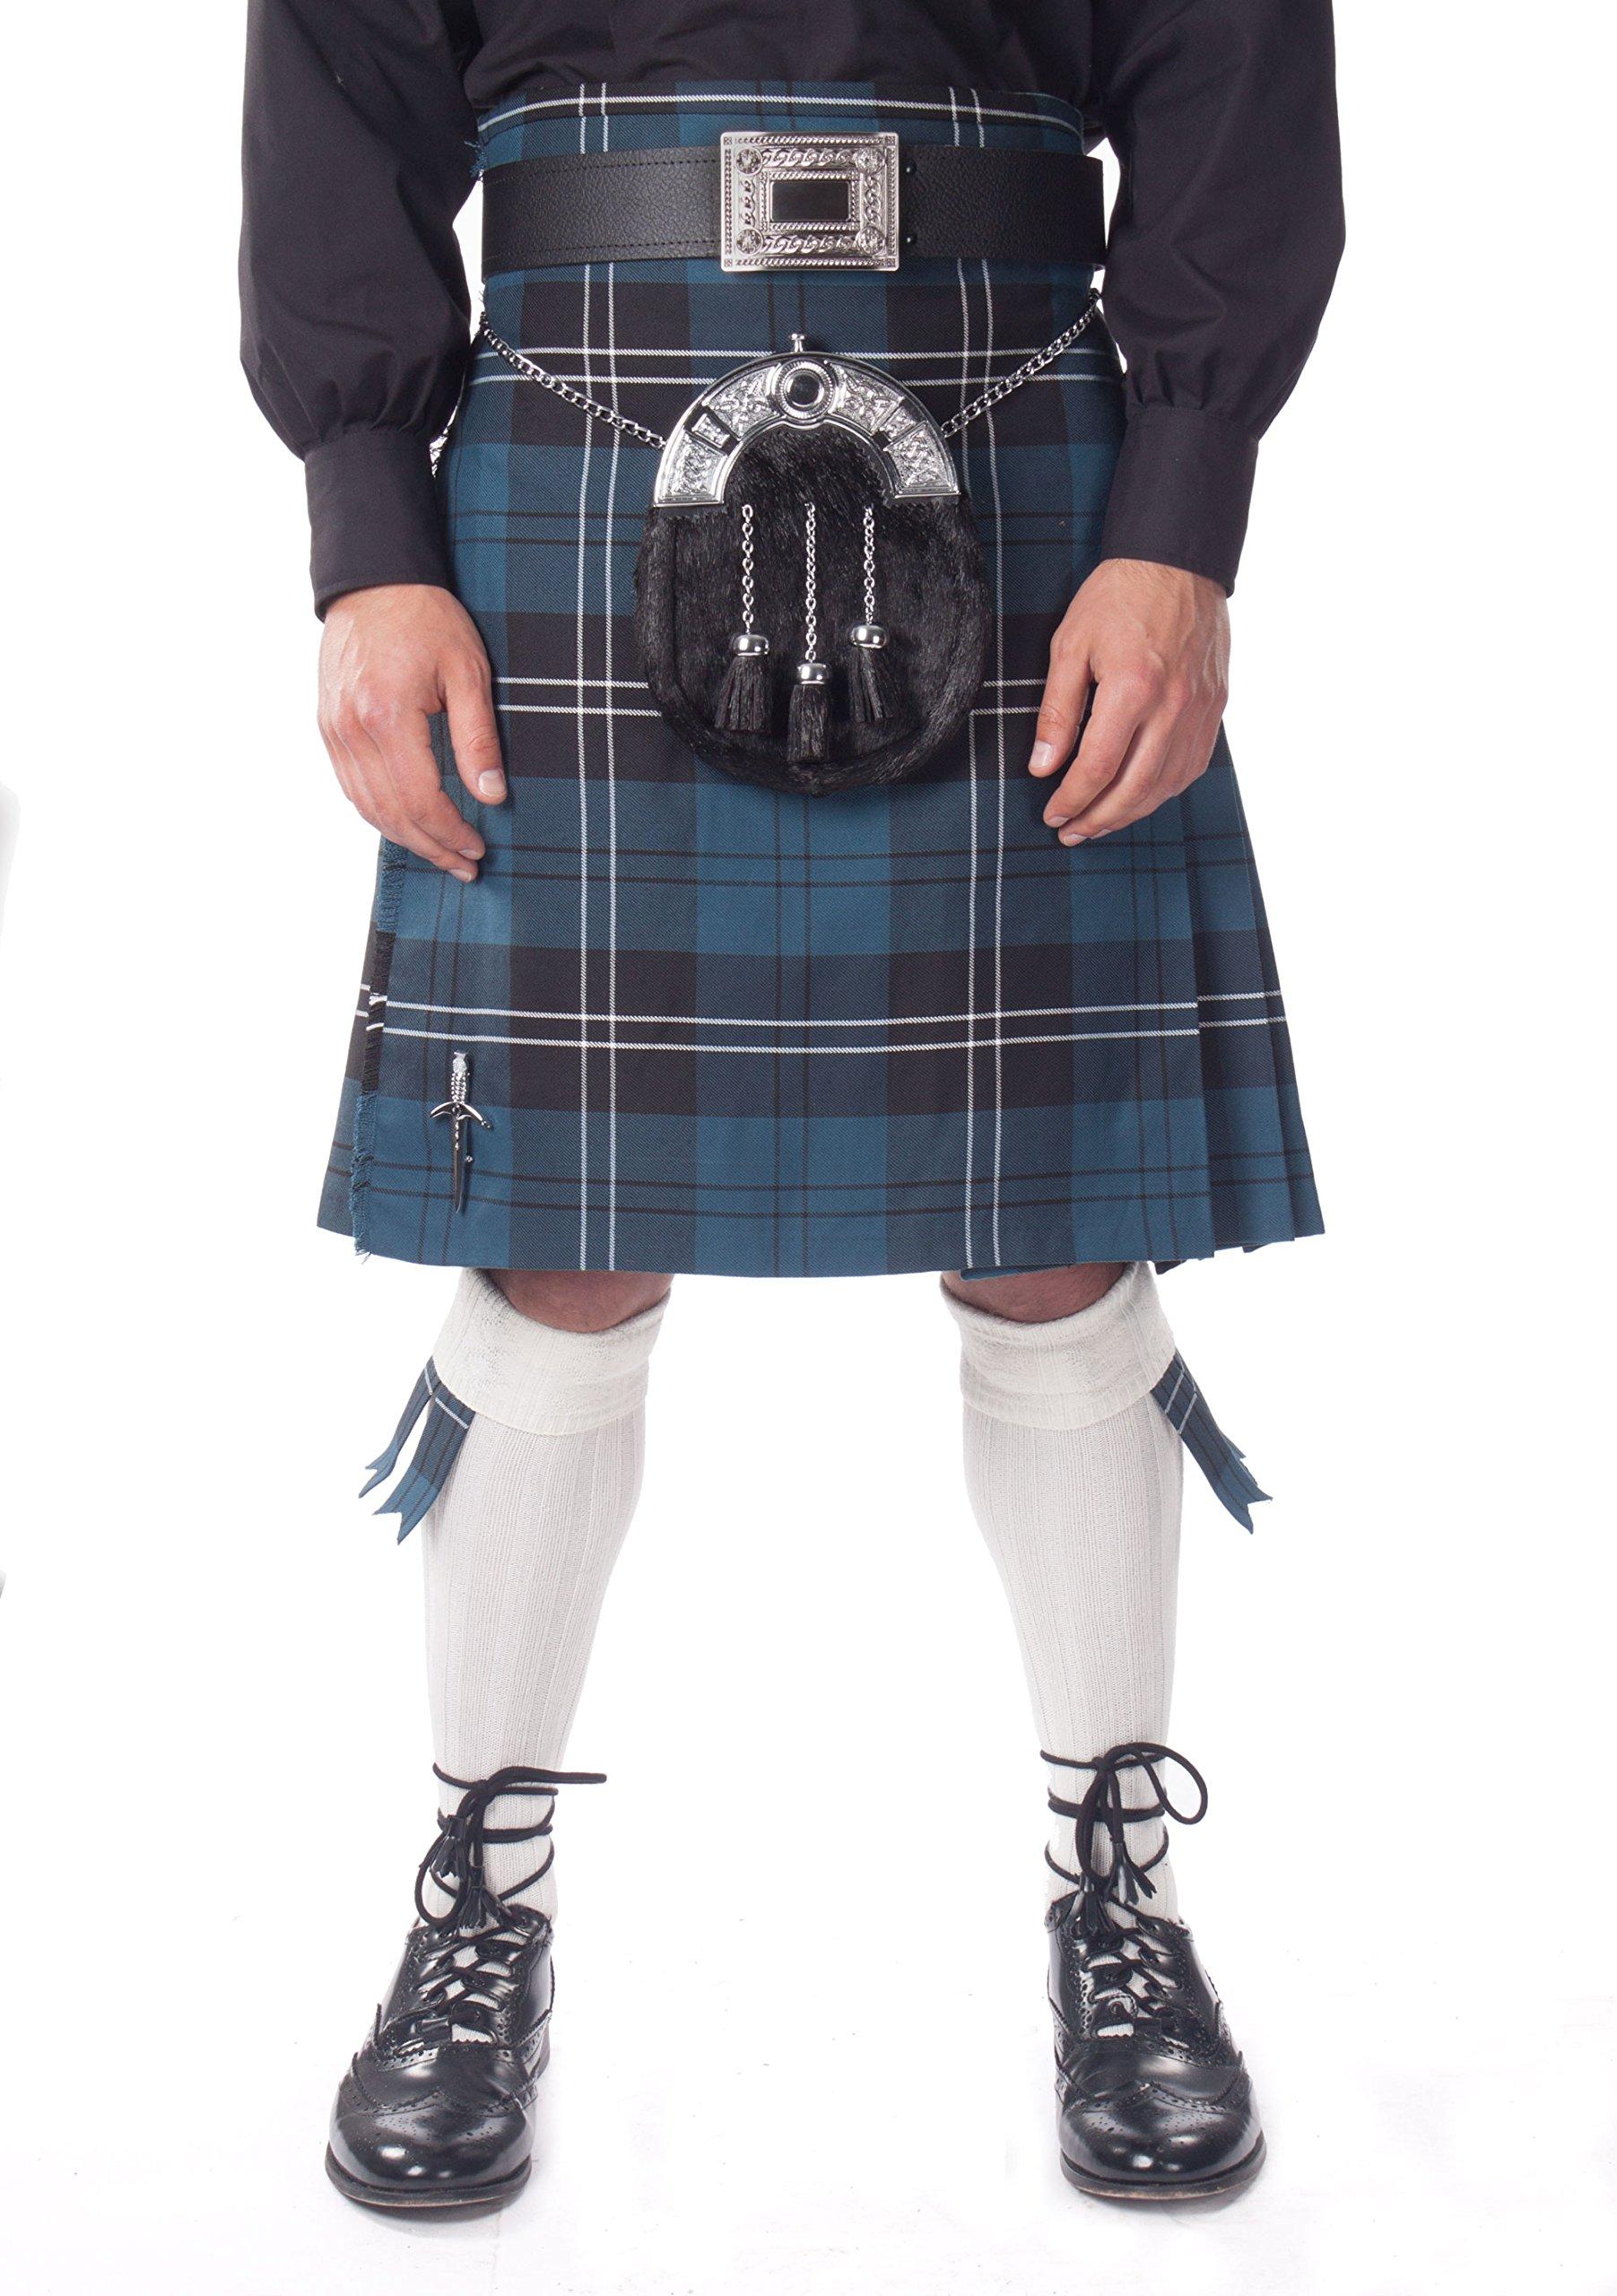 Kilt Society Mens 7 Piece Full Dress Kilt Outfit- Ramsay Blue Tartan with White Hose 34'' to 38''